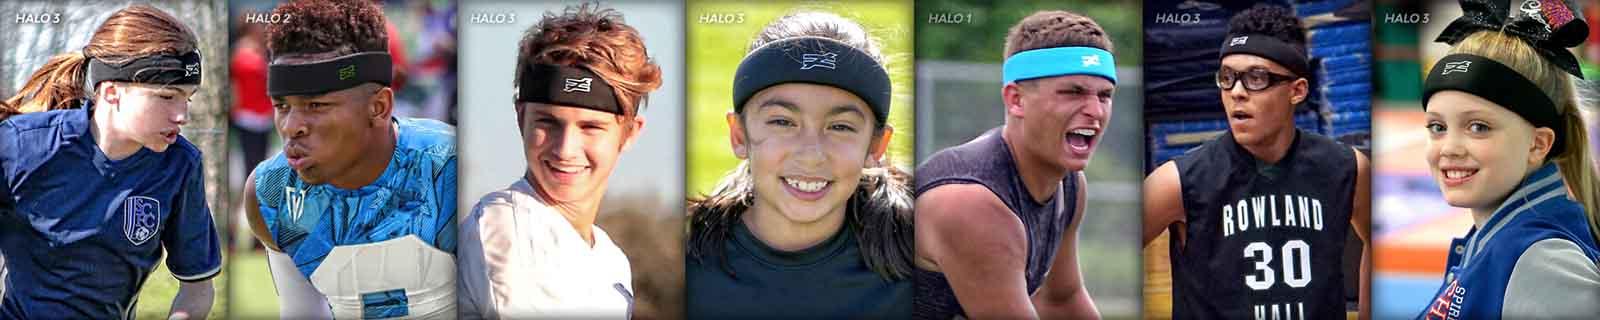 Unequal Performance Halo Headgear Headband